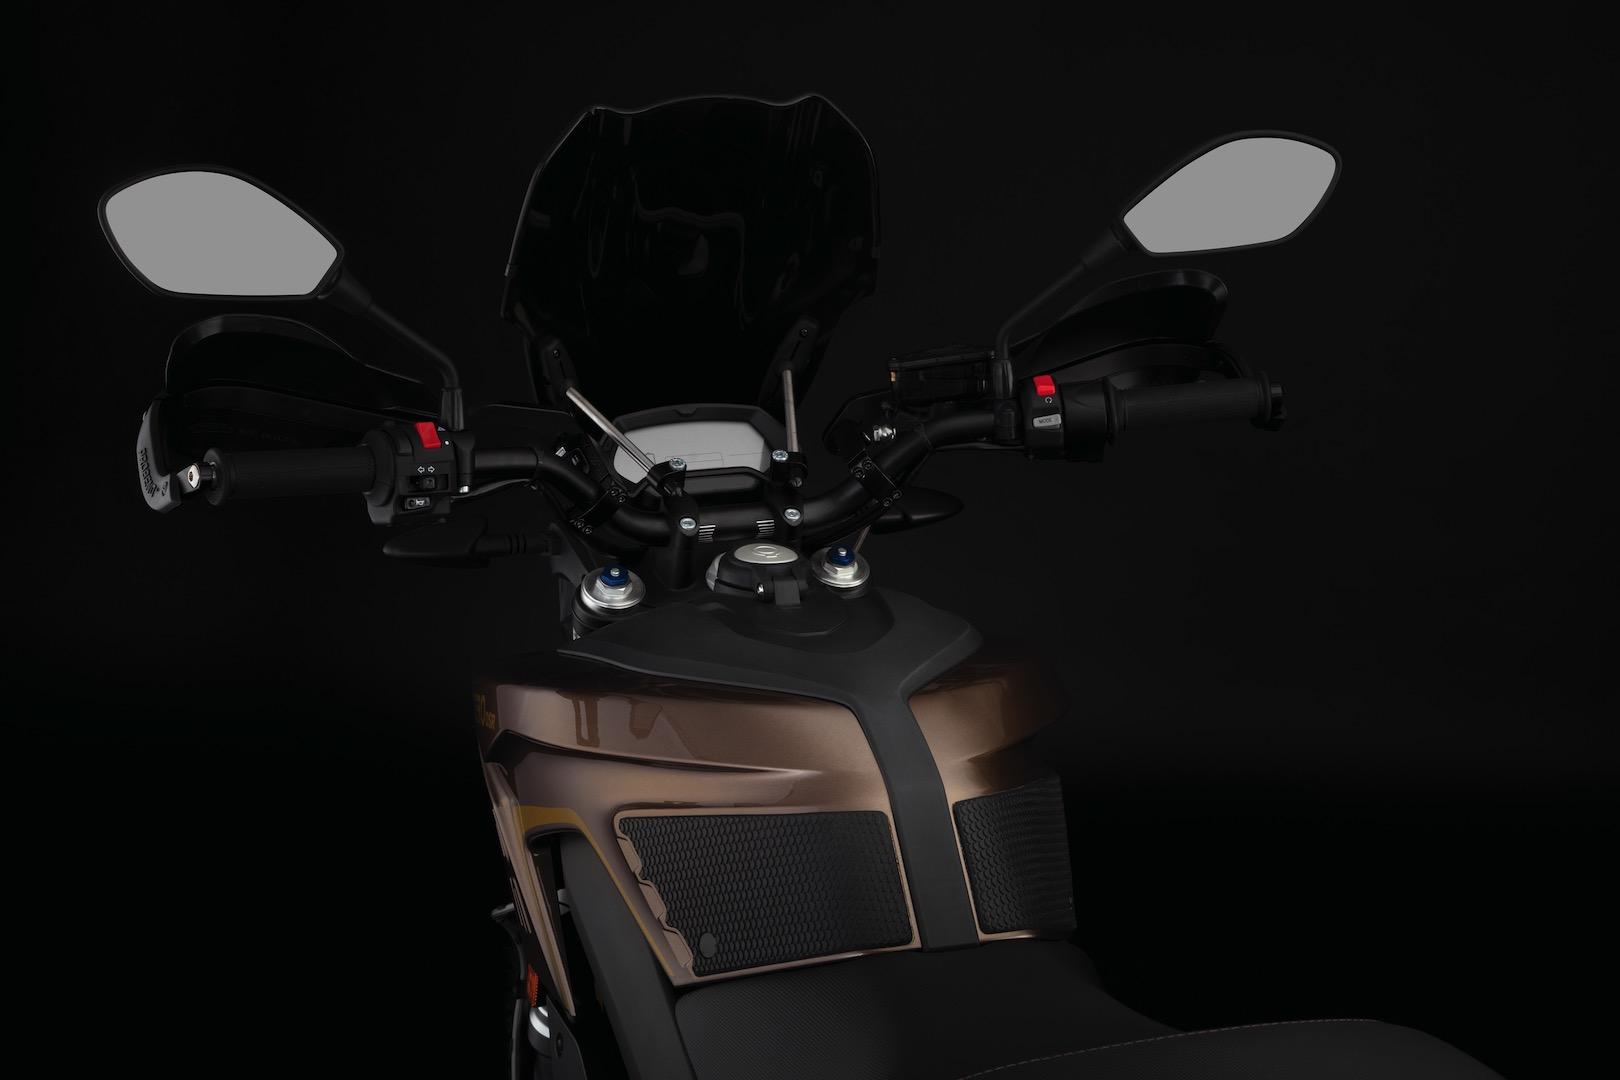 2019 Zero DSR cockpit